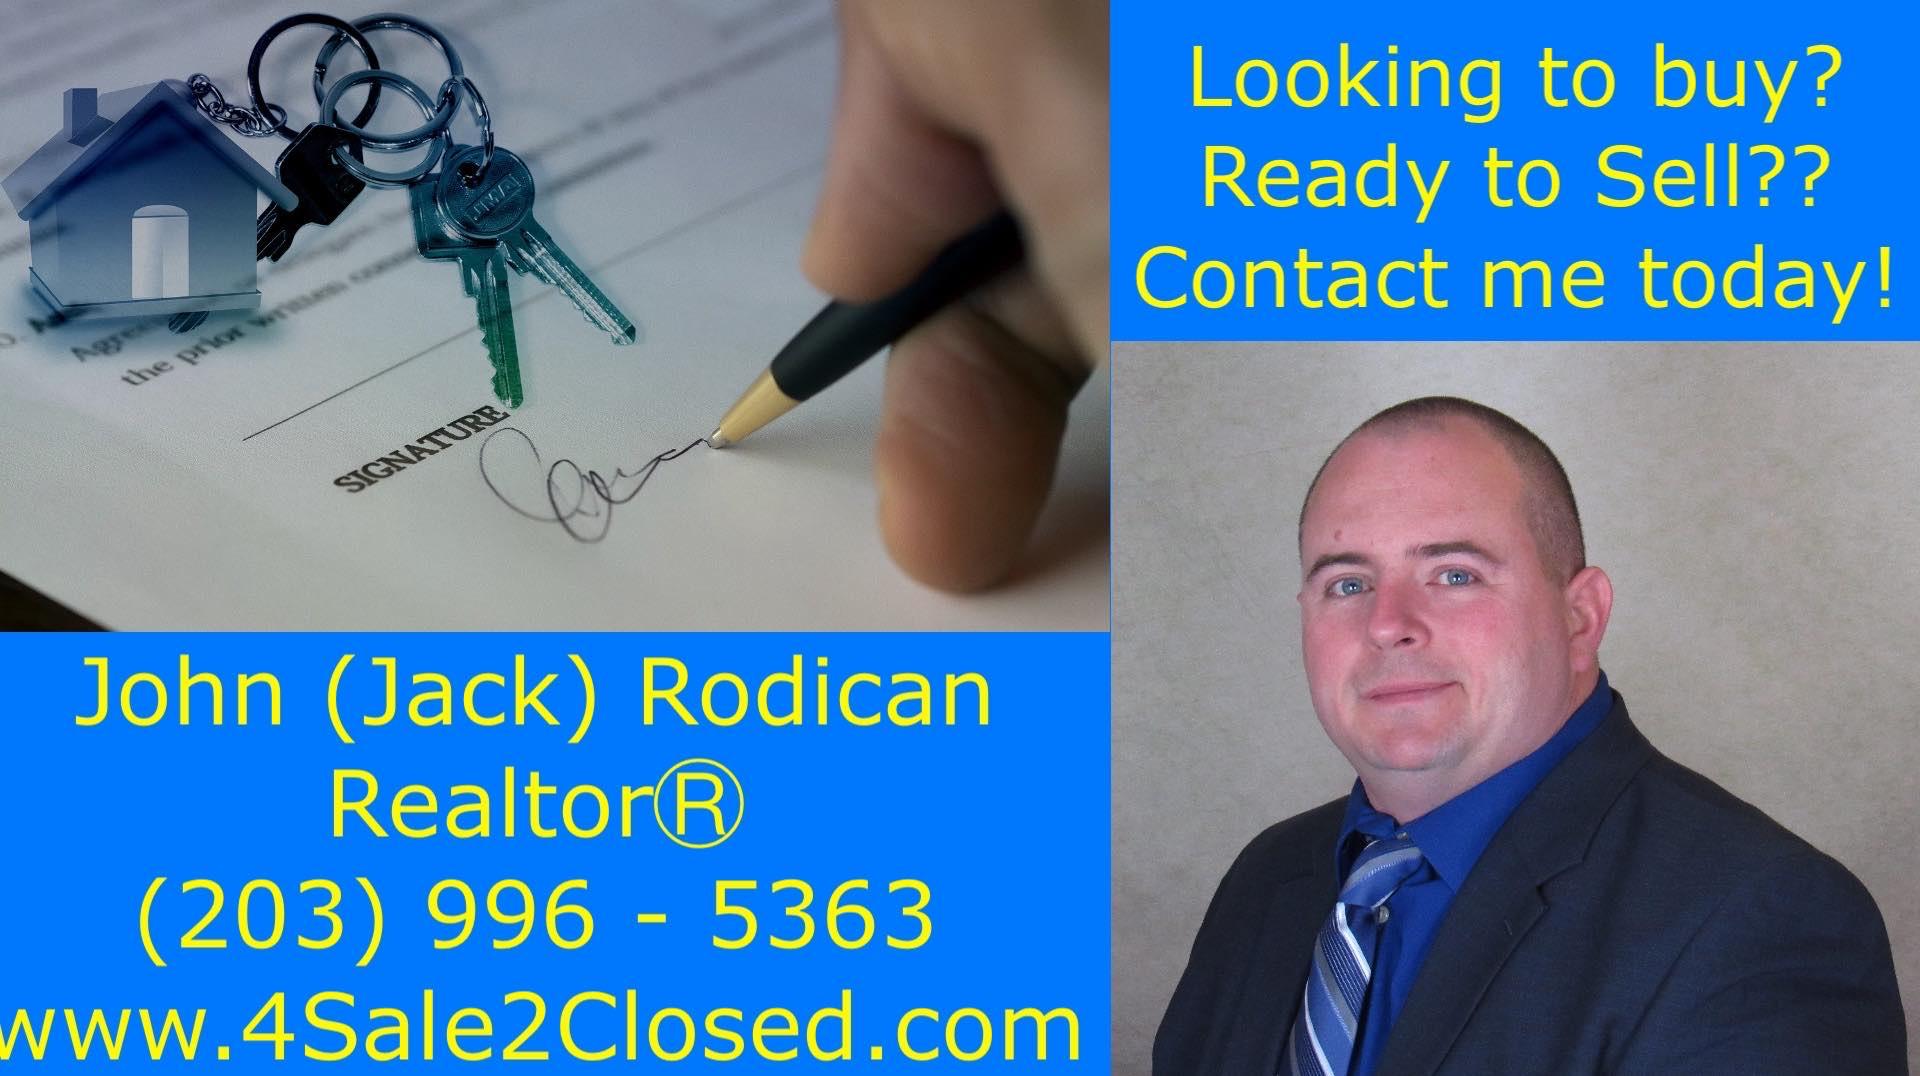 Jack Rodican